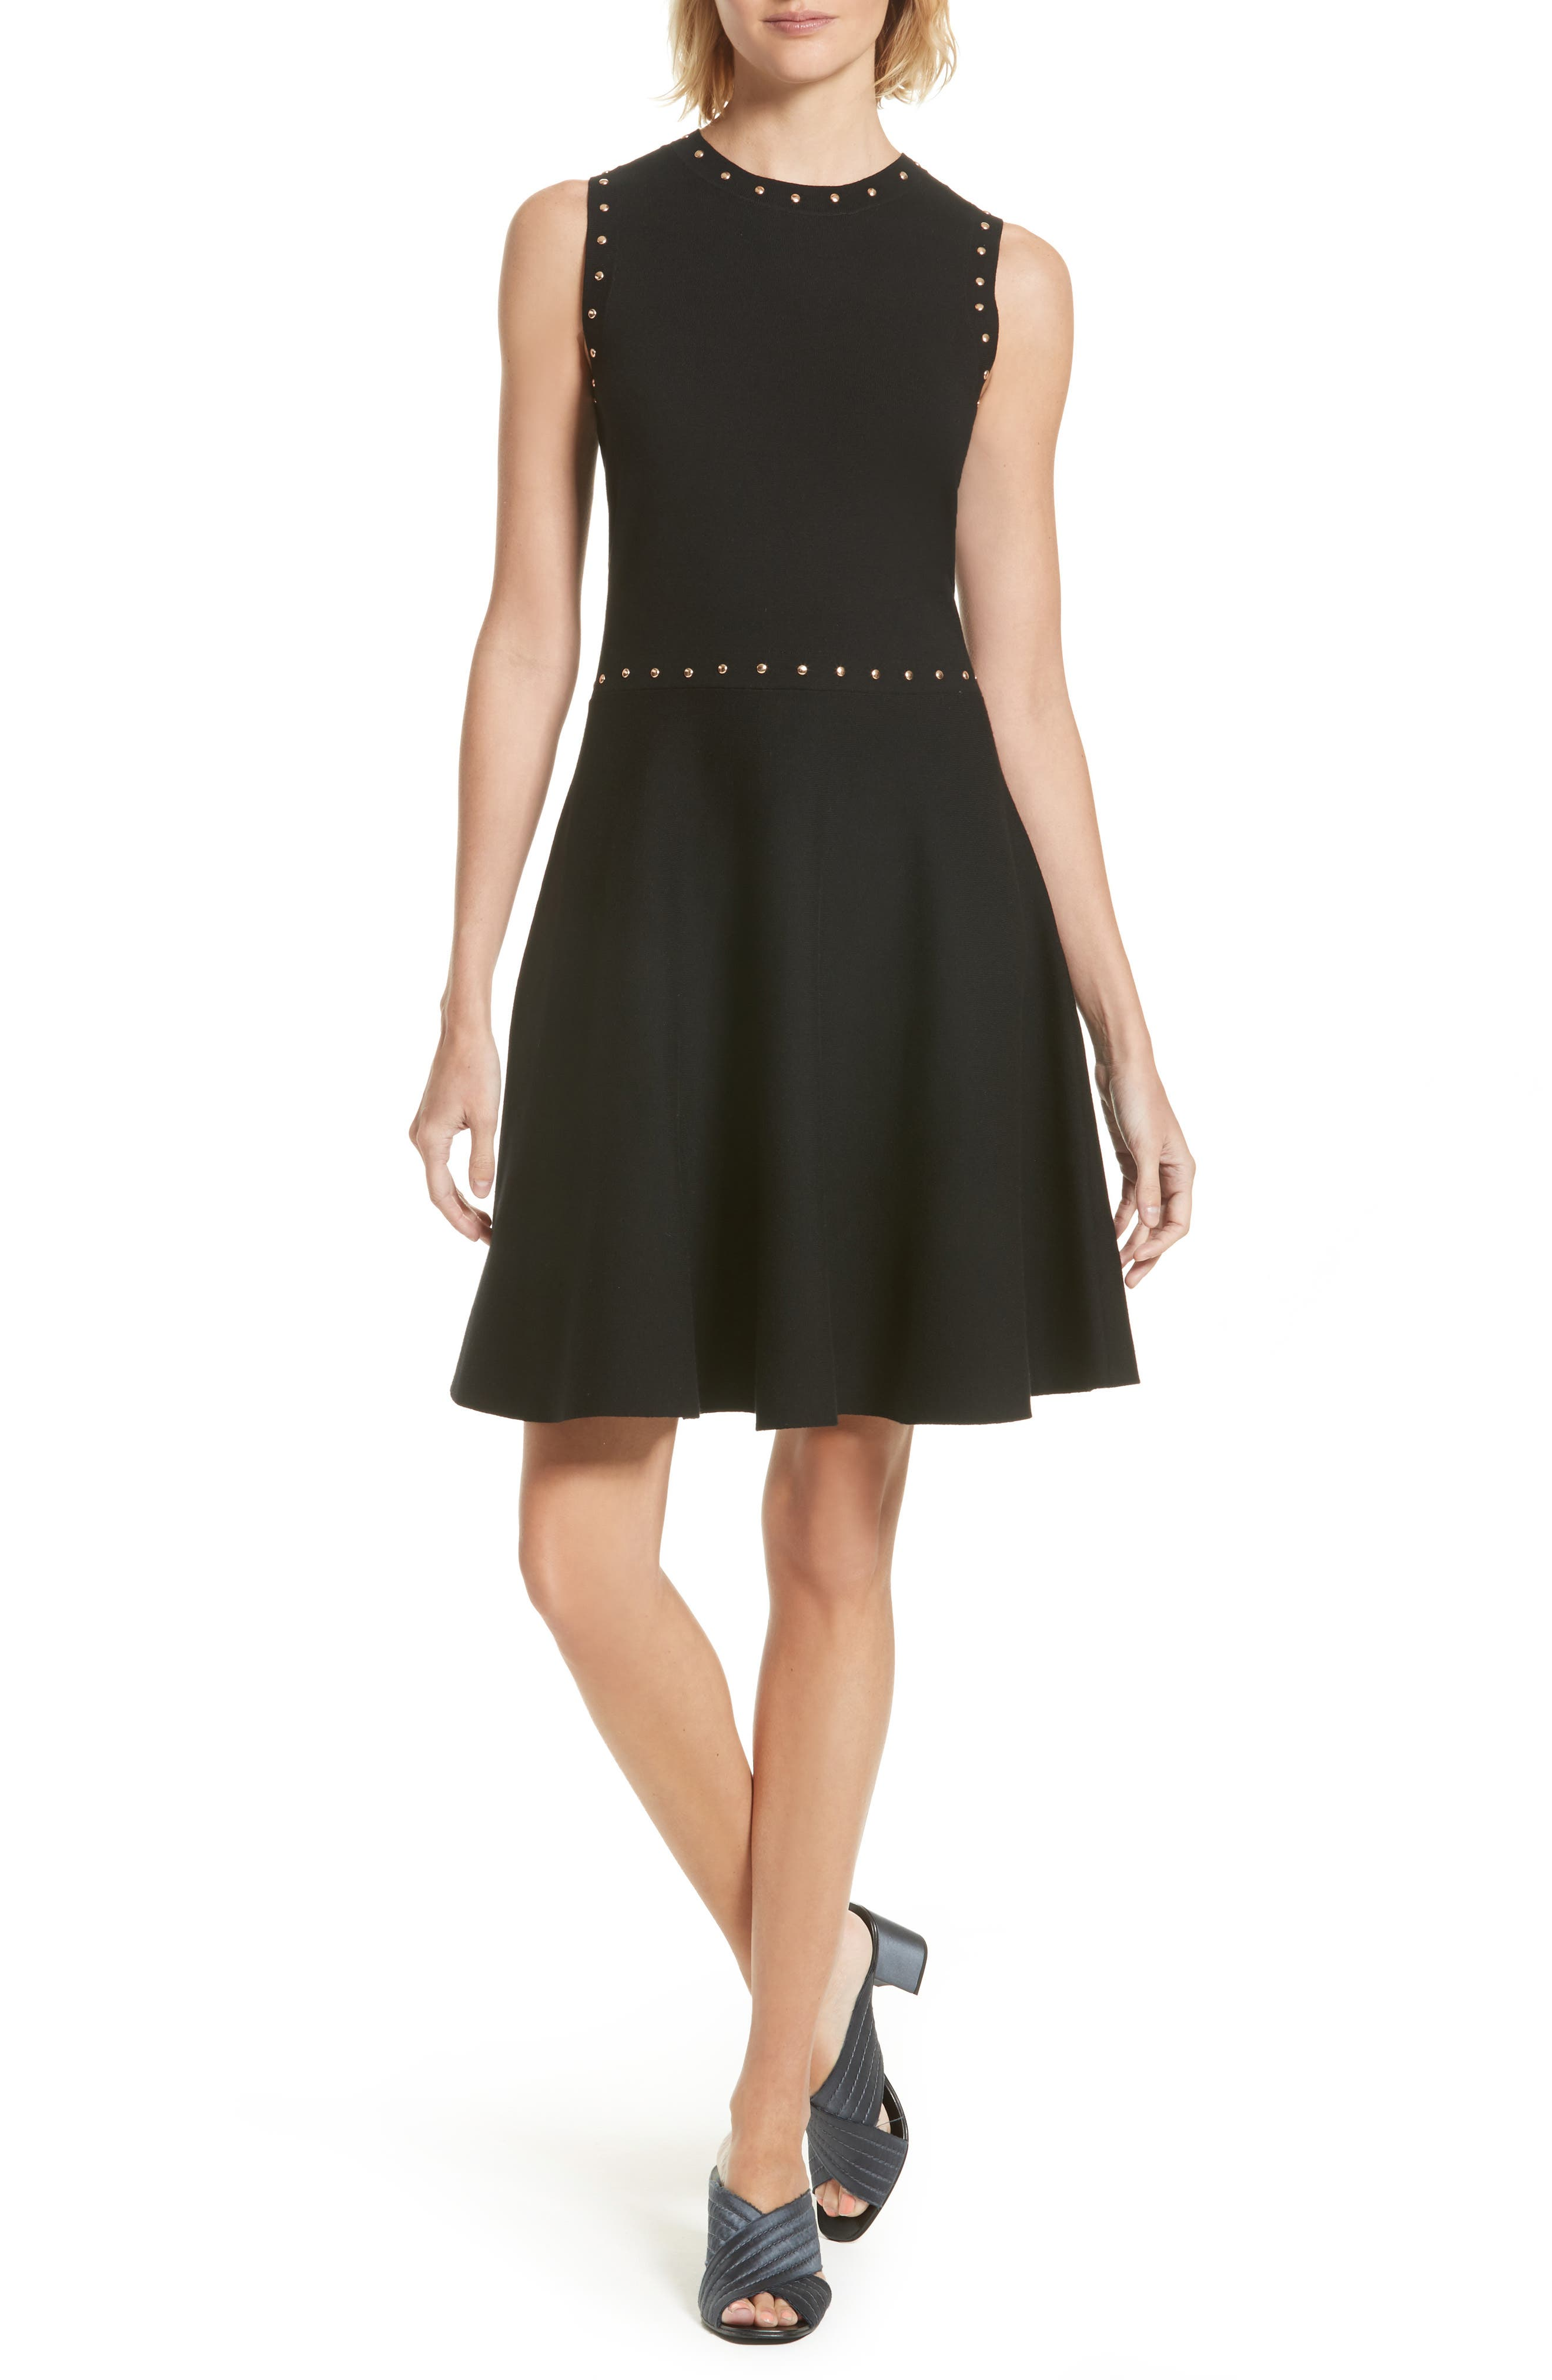 Alternate Image 1 Selected - kate spade new york studded fit & flare dress